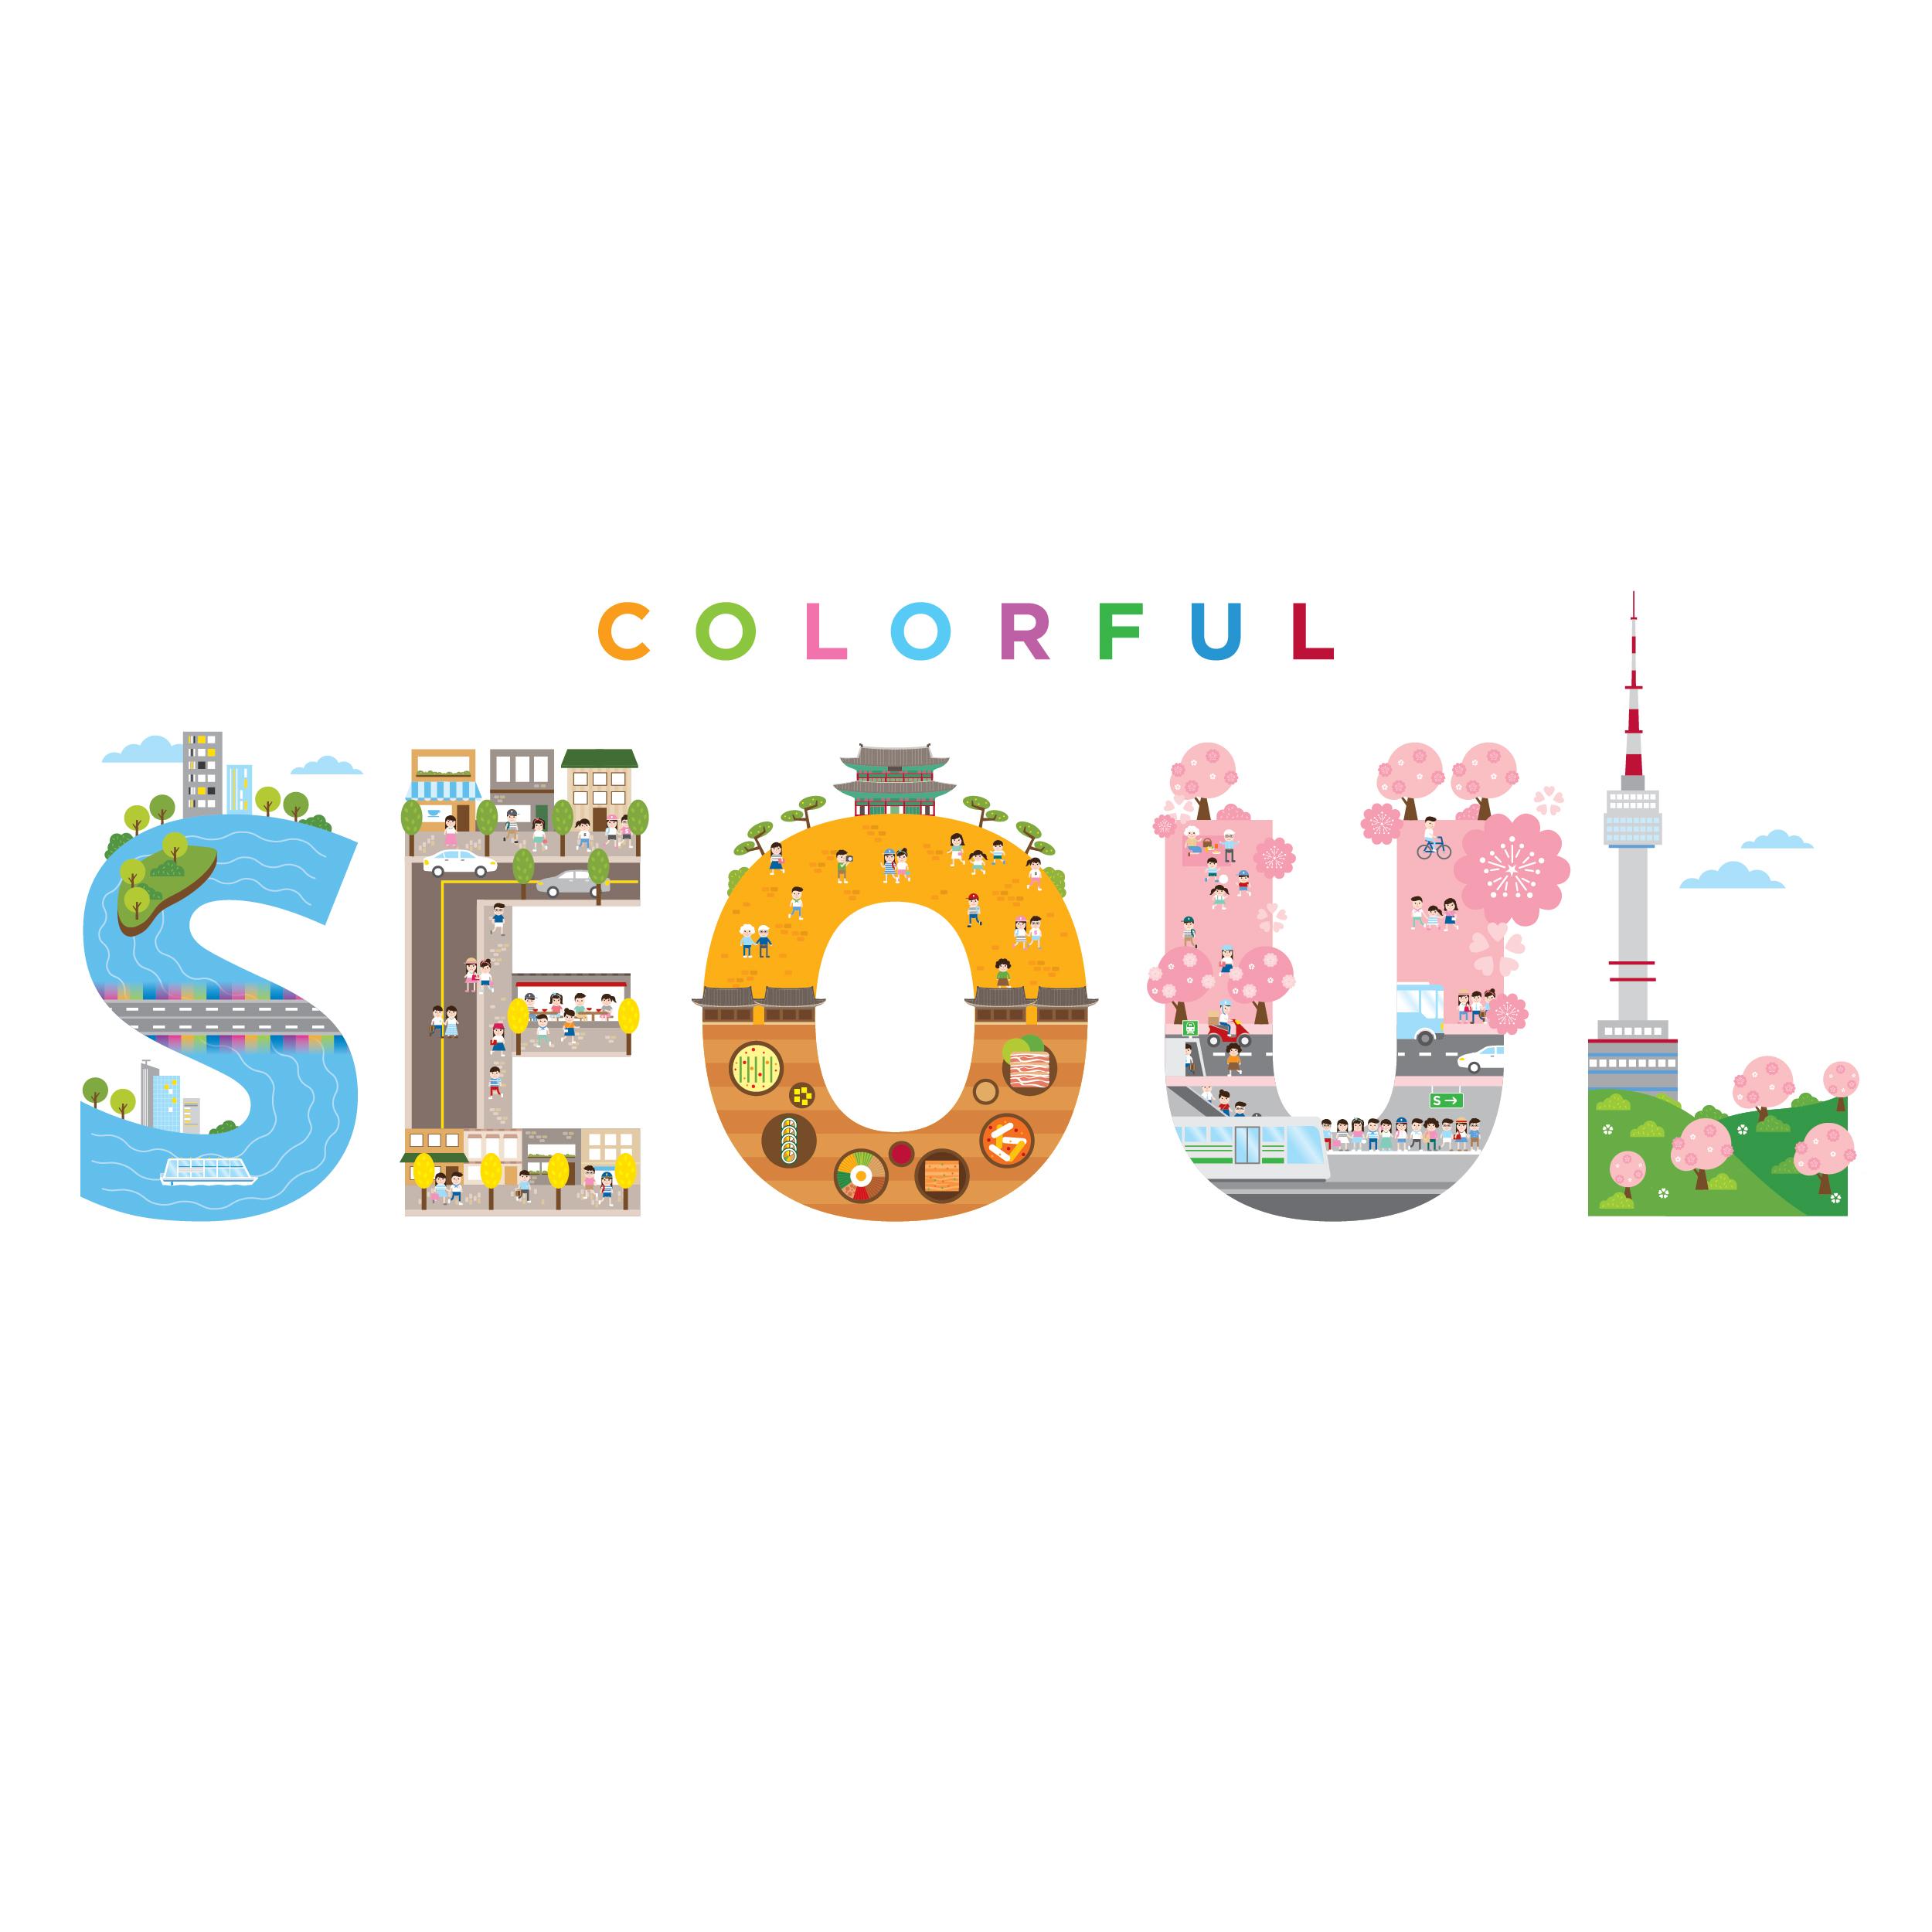 Seoul Typography Contest - Karen Leopold